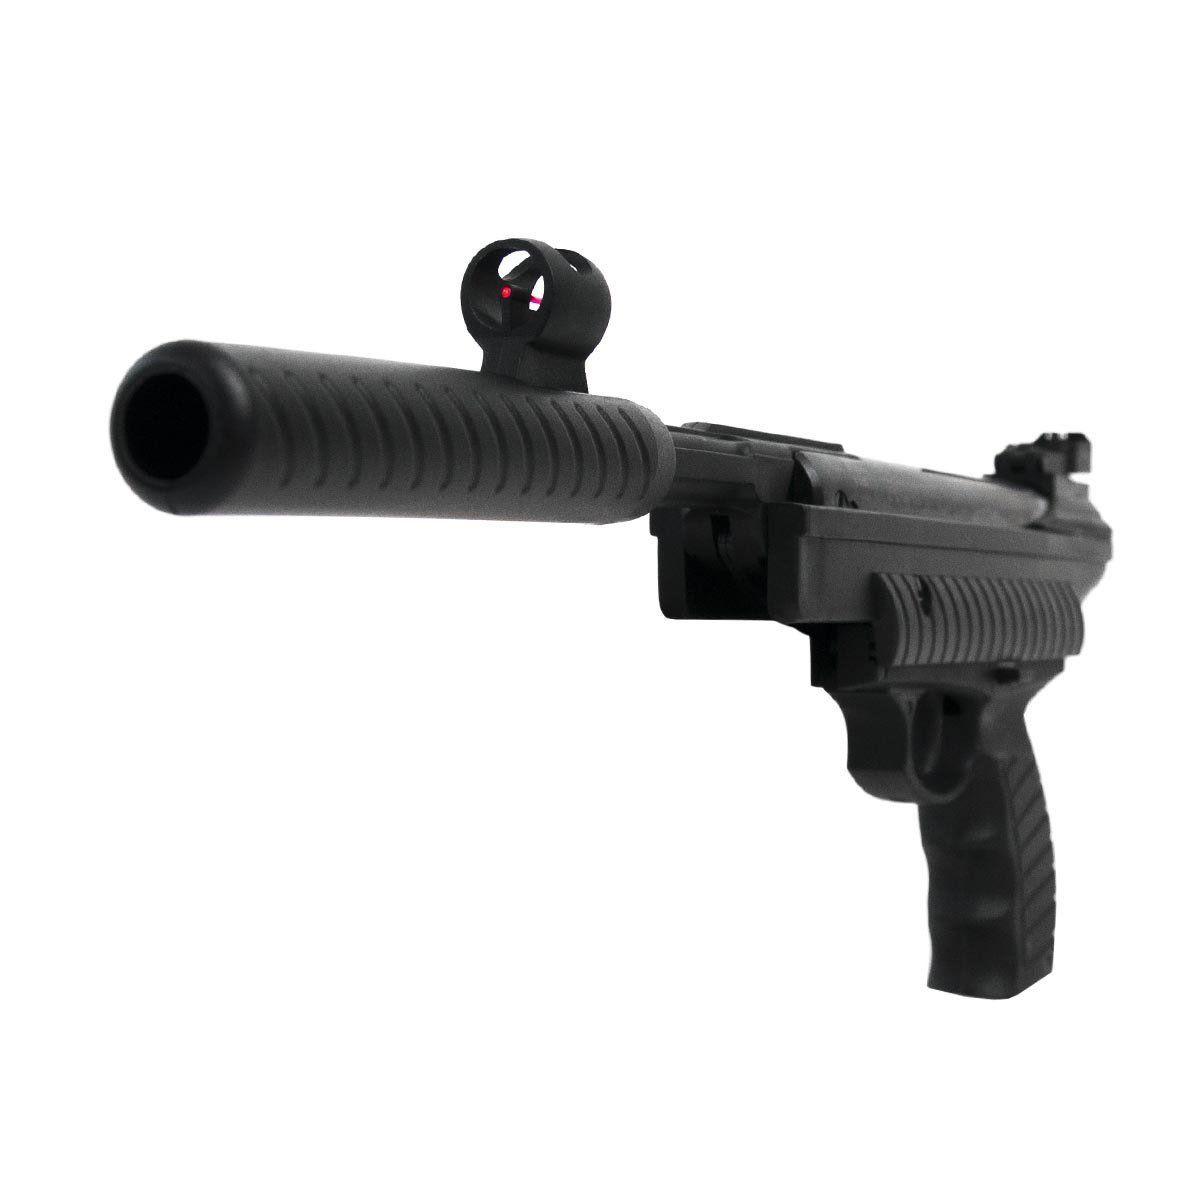 Pistola Pressão Hatsan HT25 Spring 4,5mm+Coletor de Chumbinhos+Alvo+Óleo+Óculos